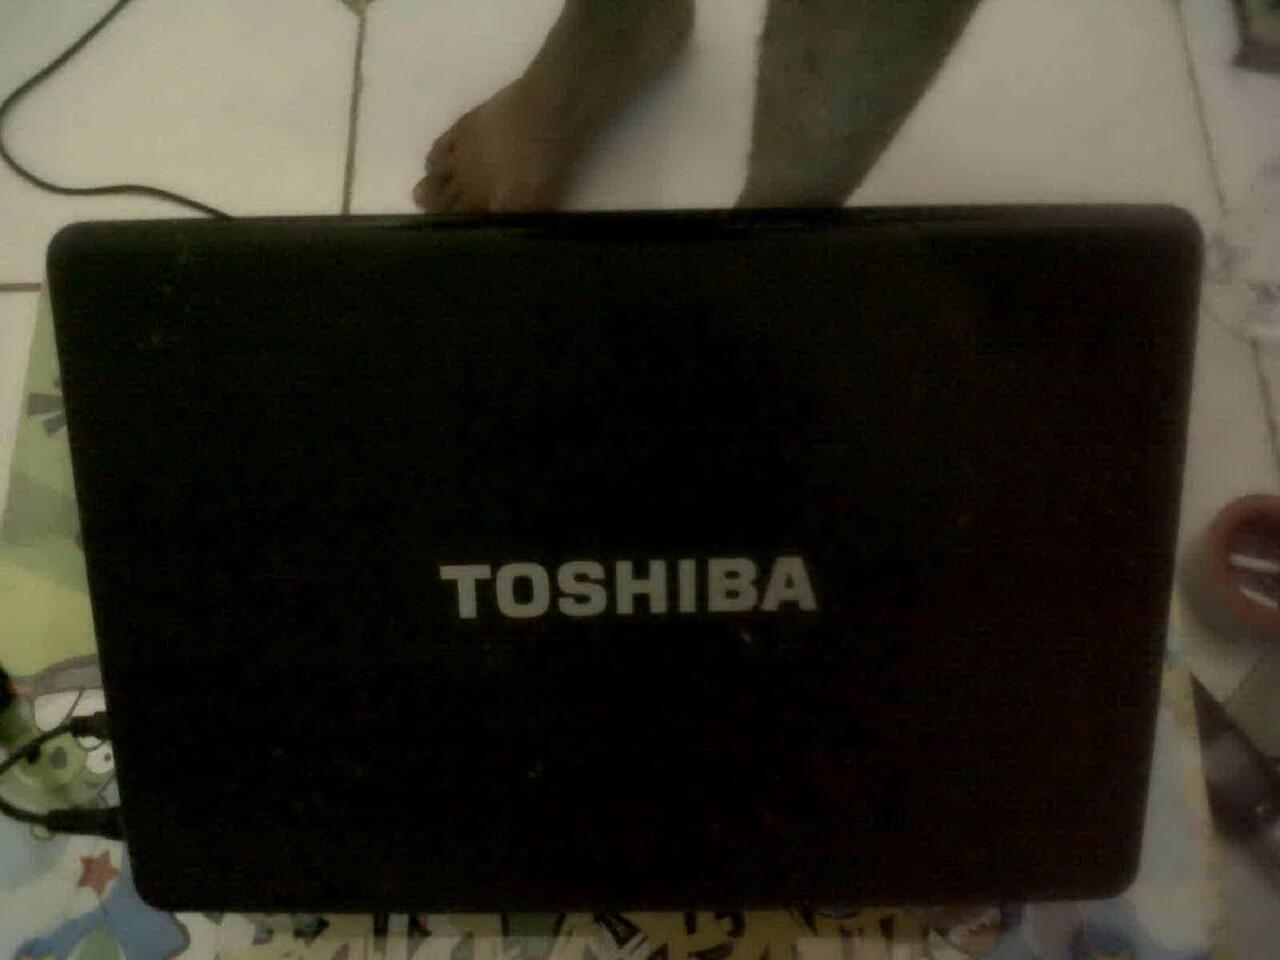 Toshiba Satellite L510